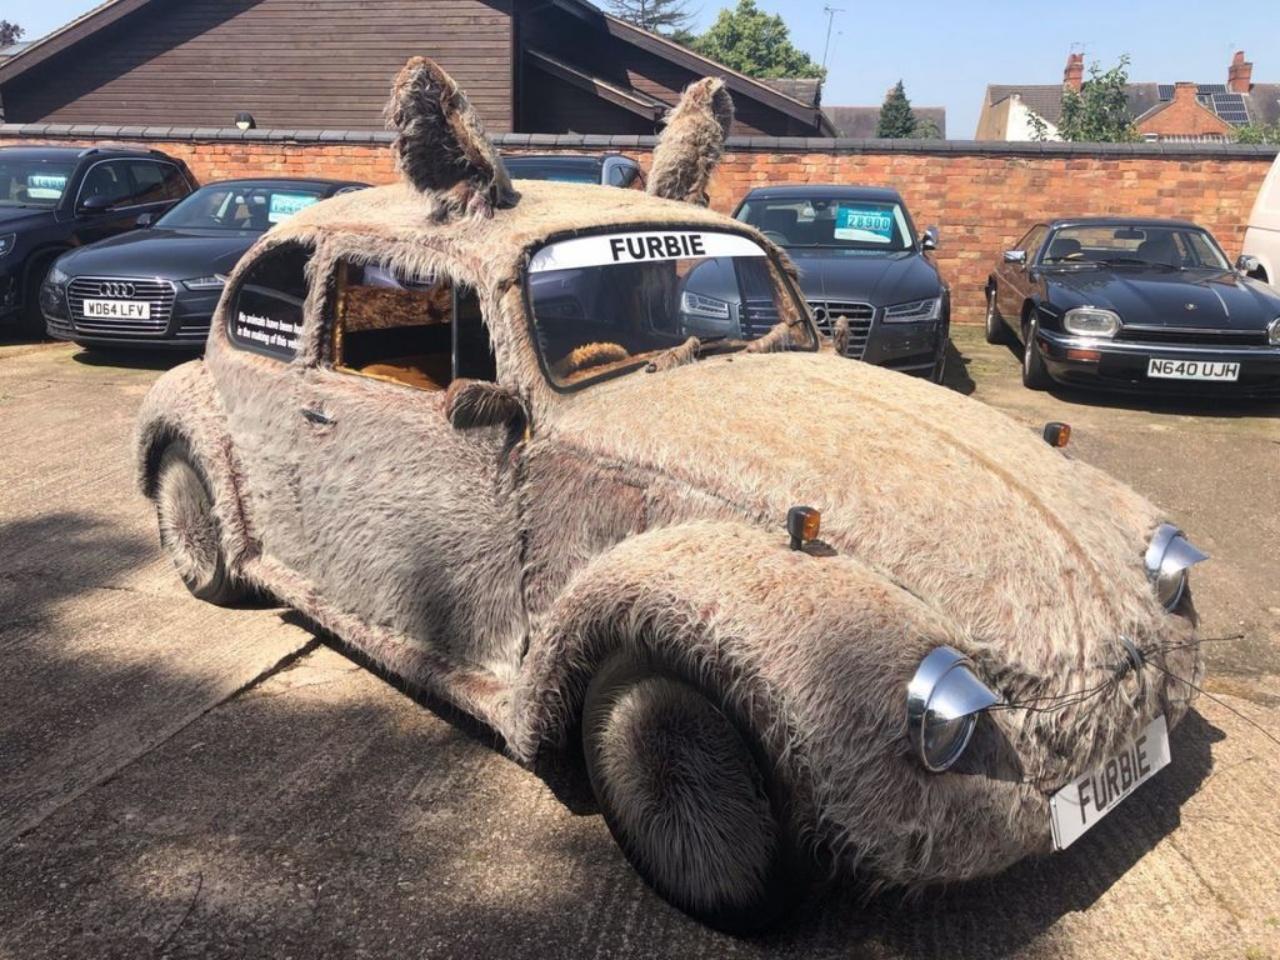 Volkswagen-Beetle-Furbie-1978-7